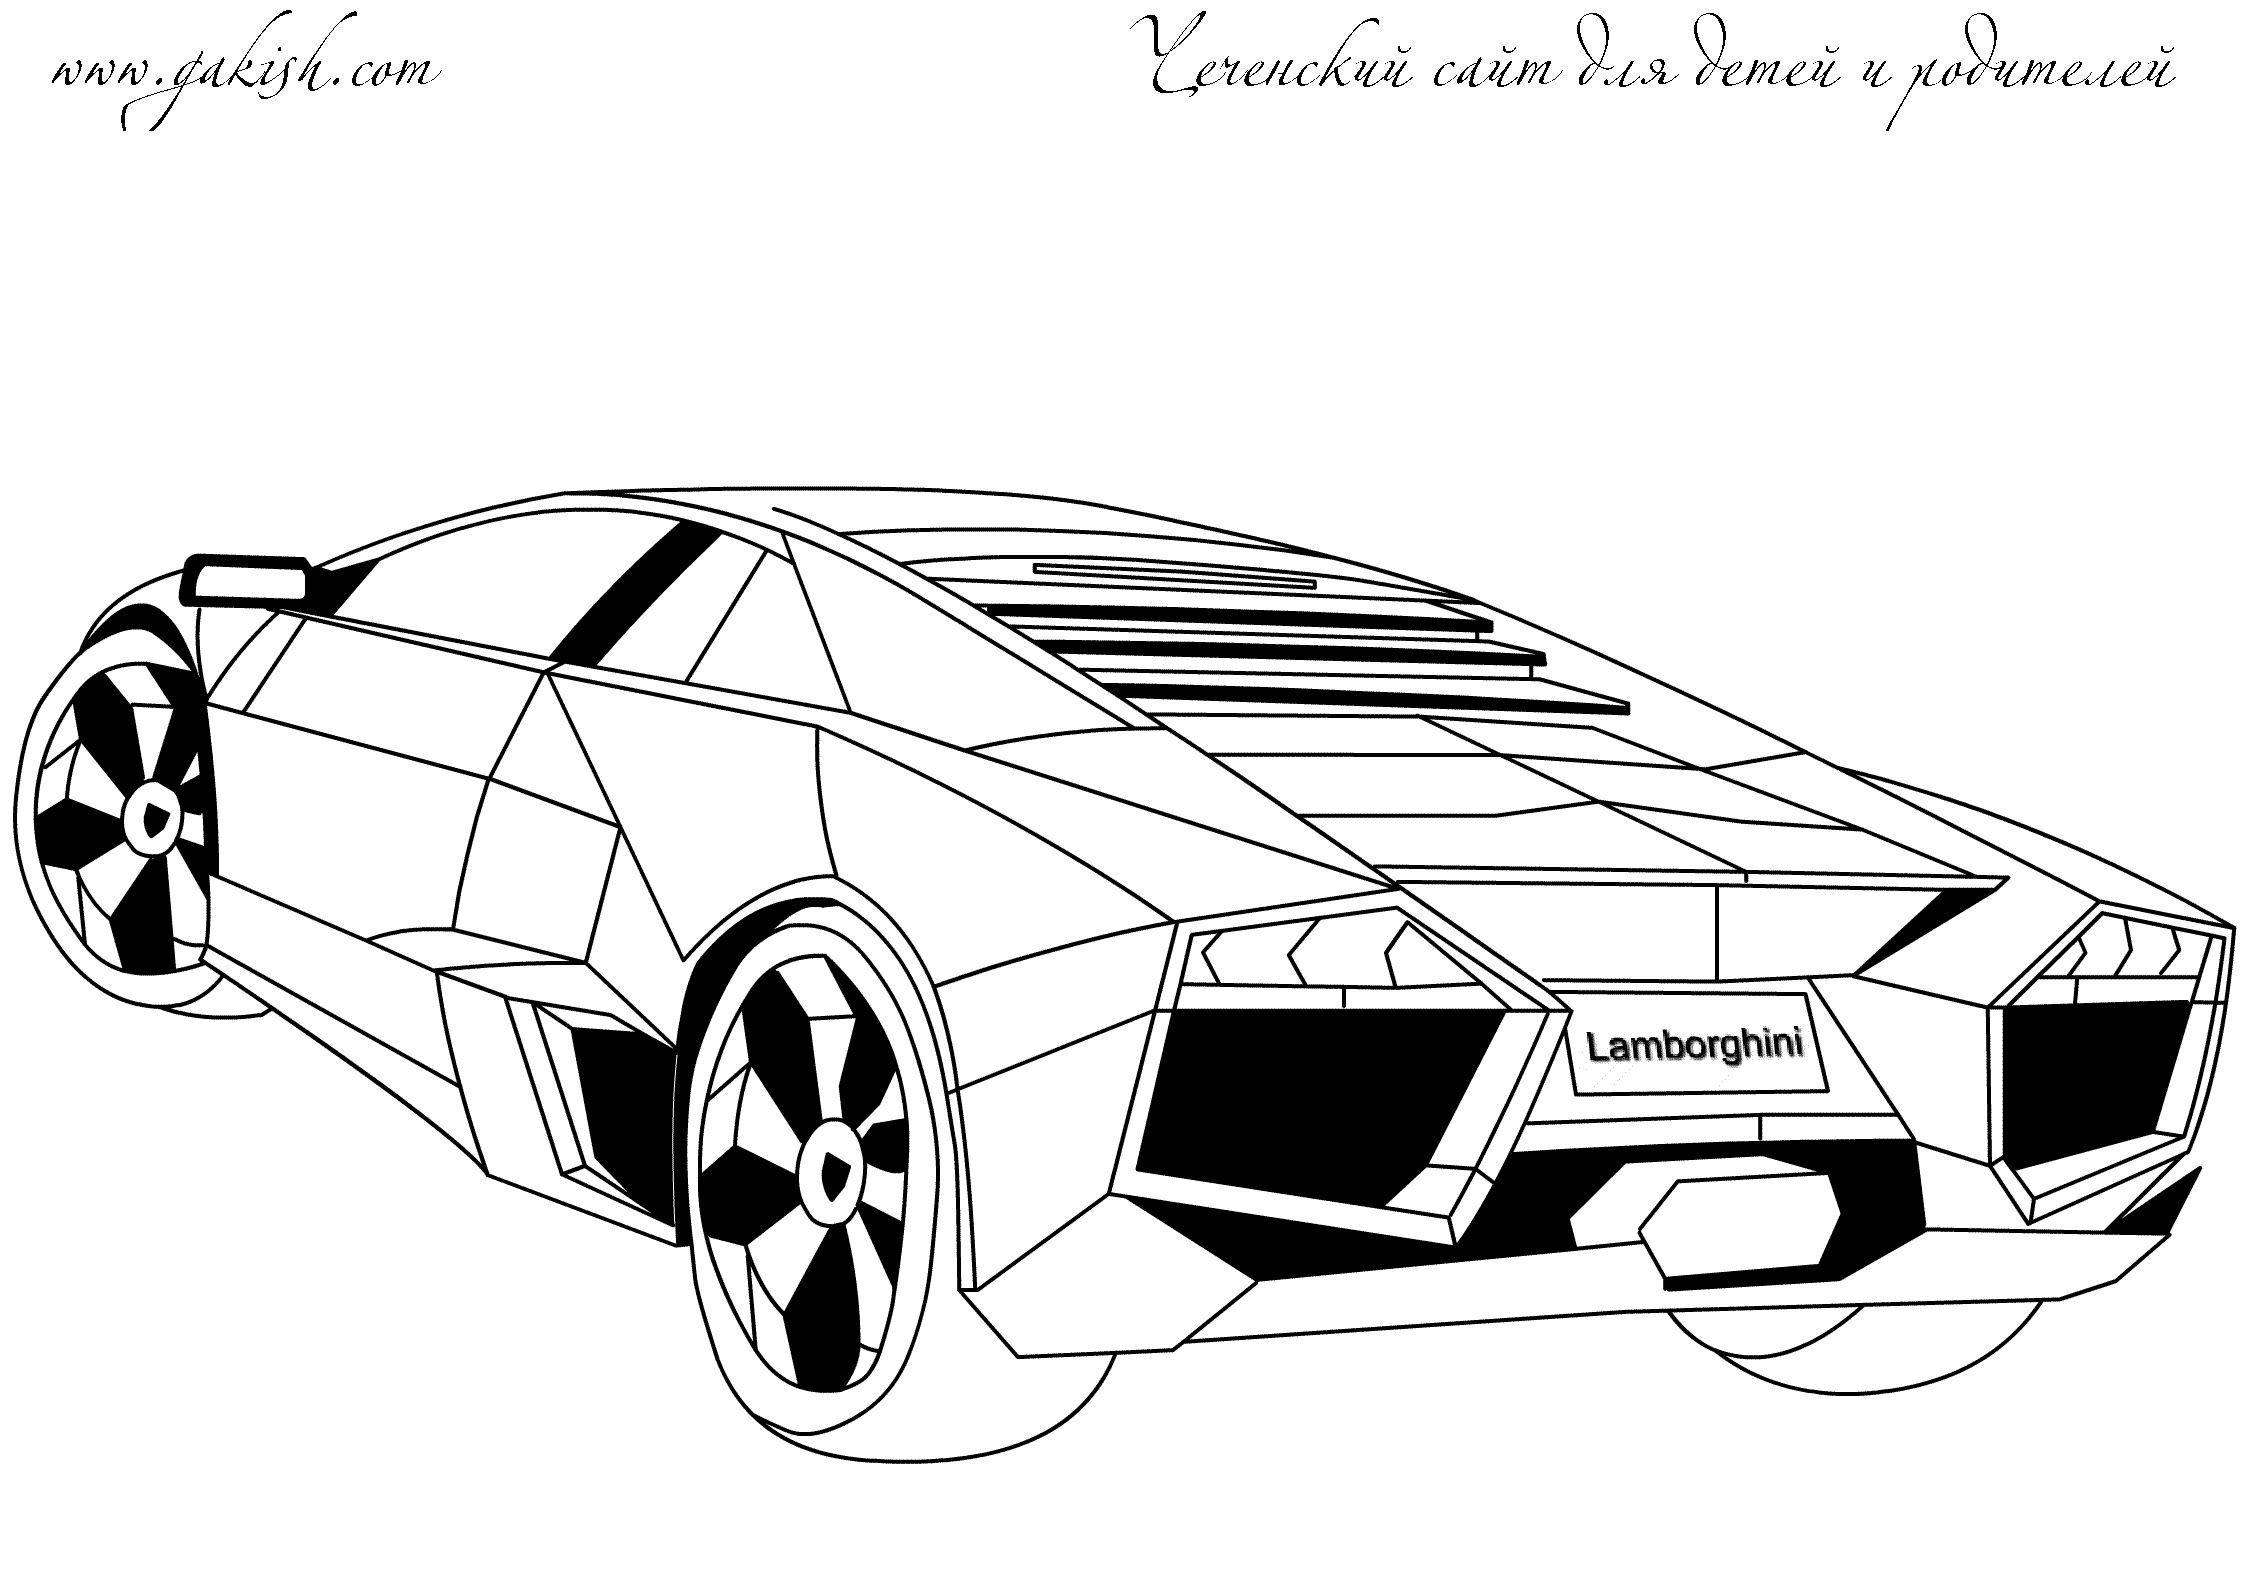 Lamborghini Aventador coloring page | Free Printable ...